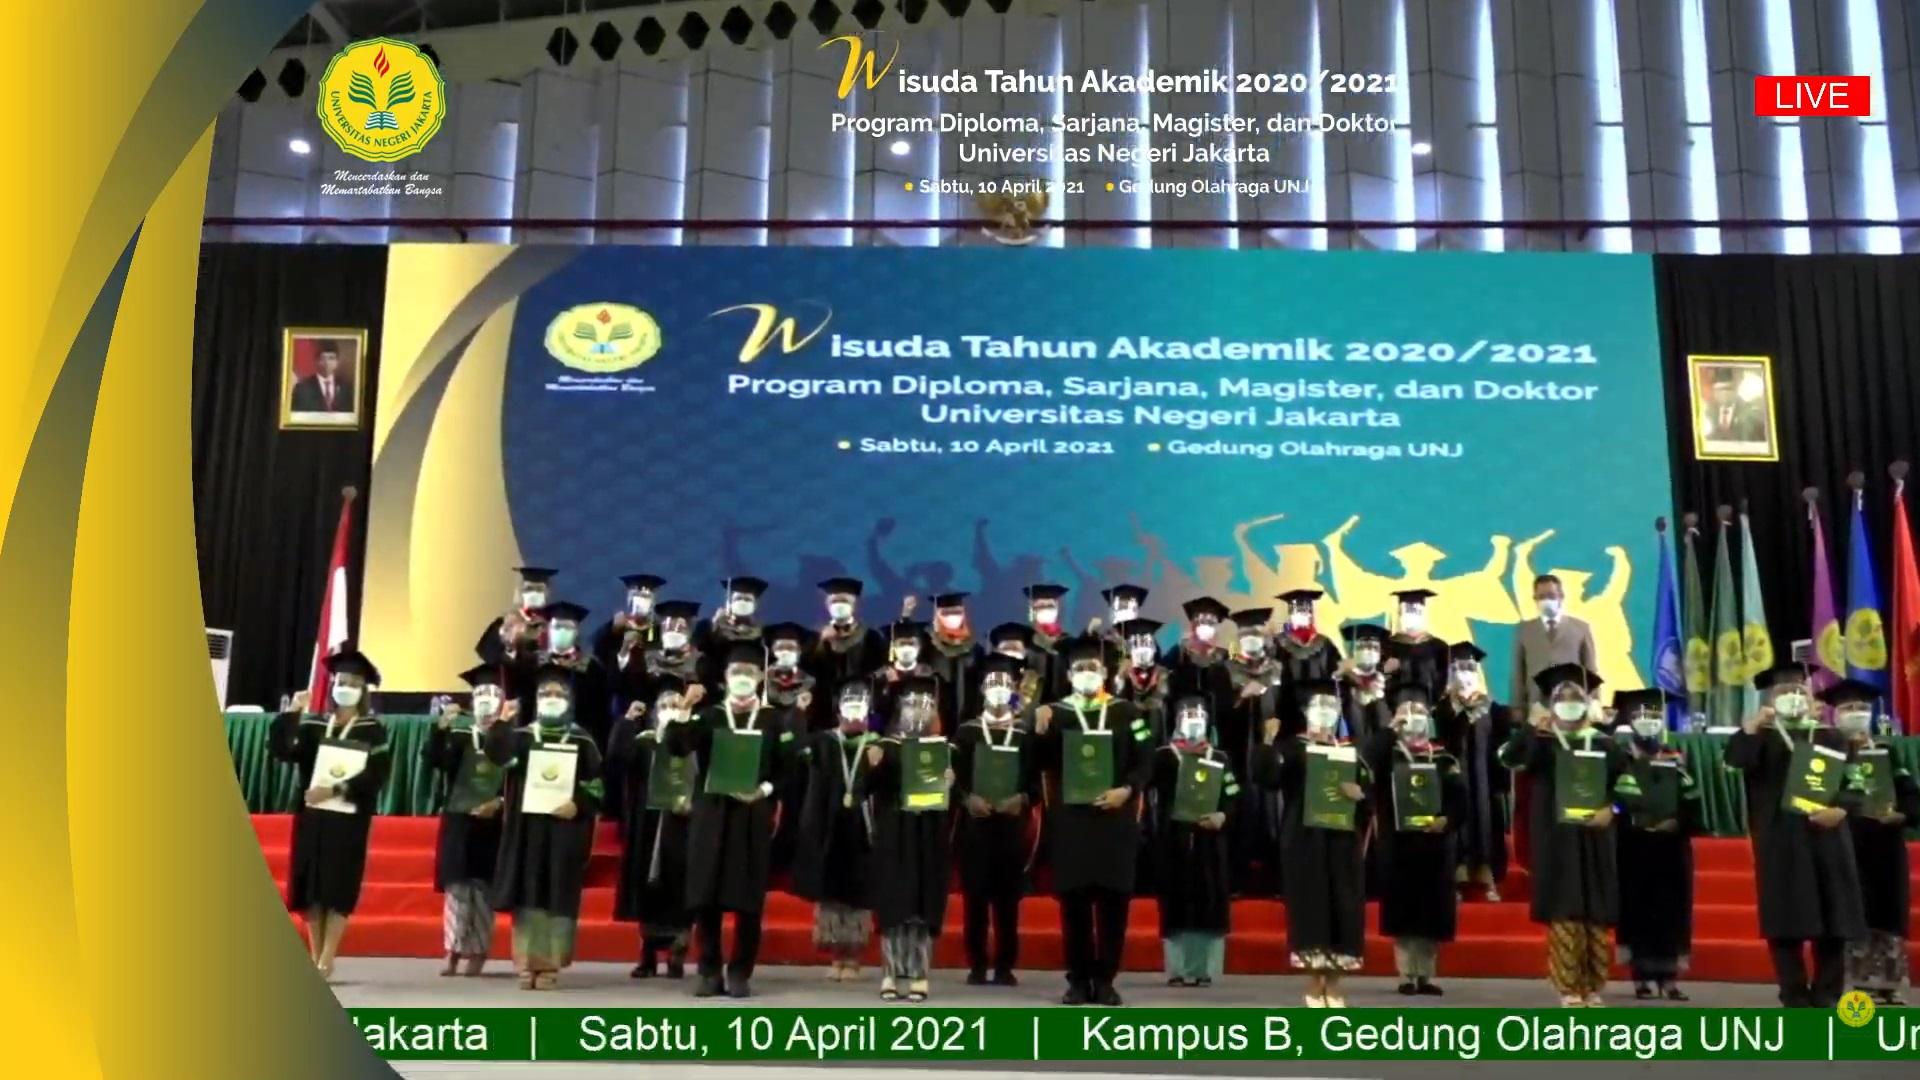 Wisuda Virtual Semester 113 Universitas Negeri Jakarta (UNJ) Tahun Akademik 2020/2021